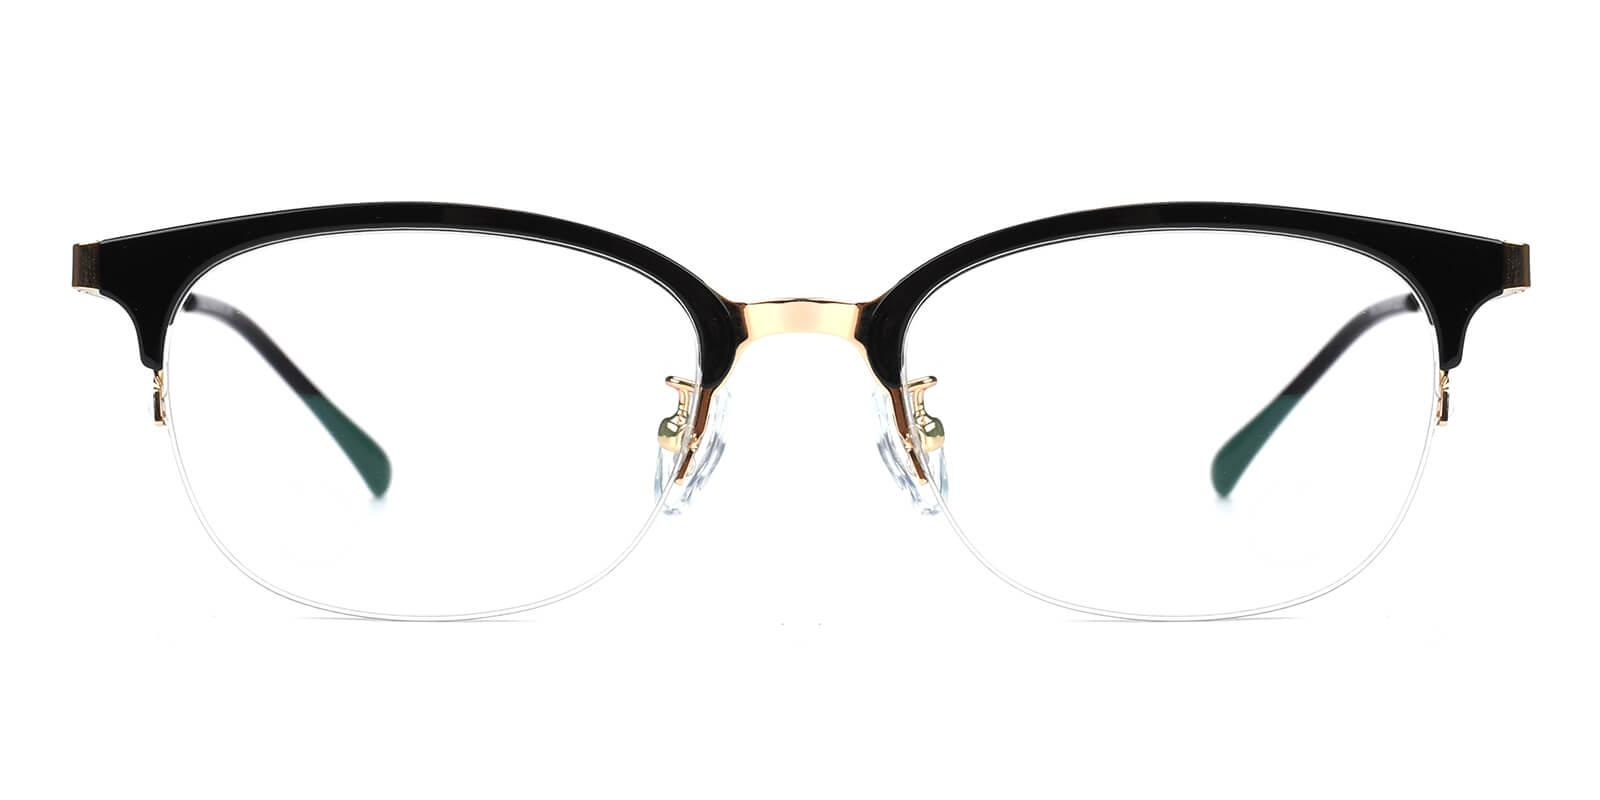 Snob-Black-Browline-Combination-Eyeglasses-detail